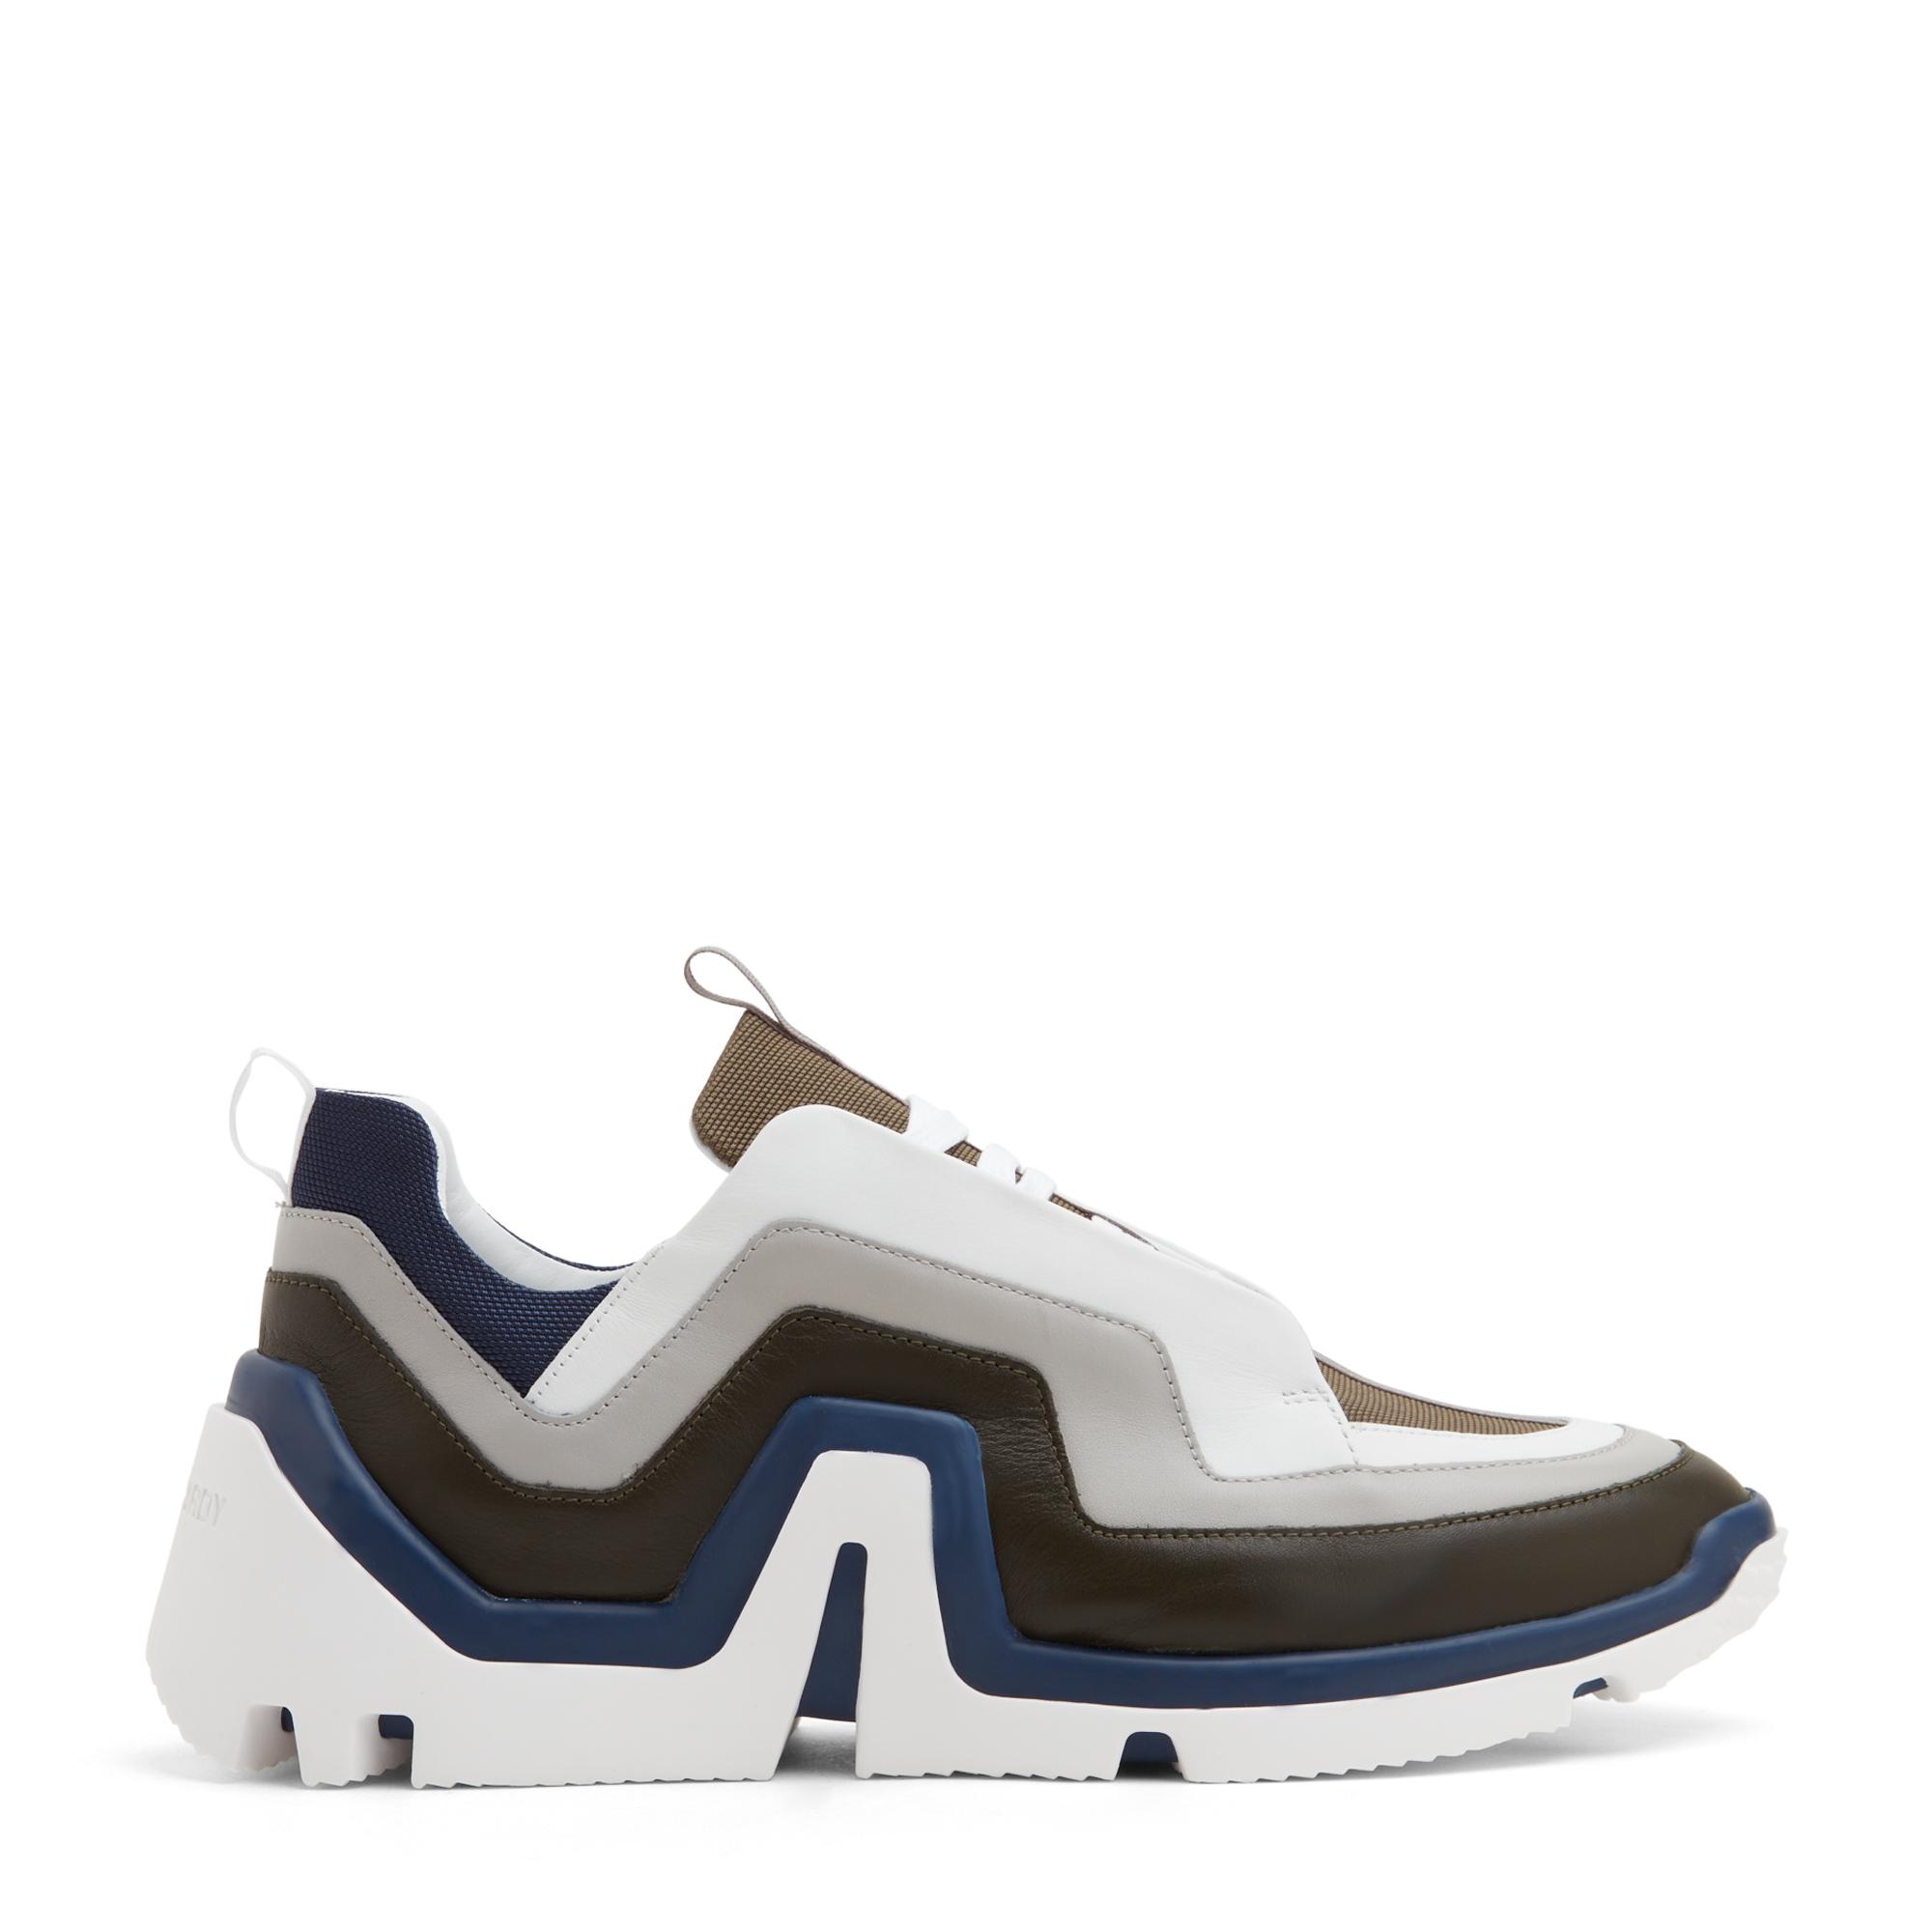 Vibe sneakers